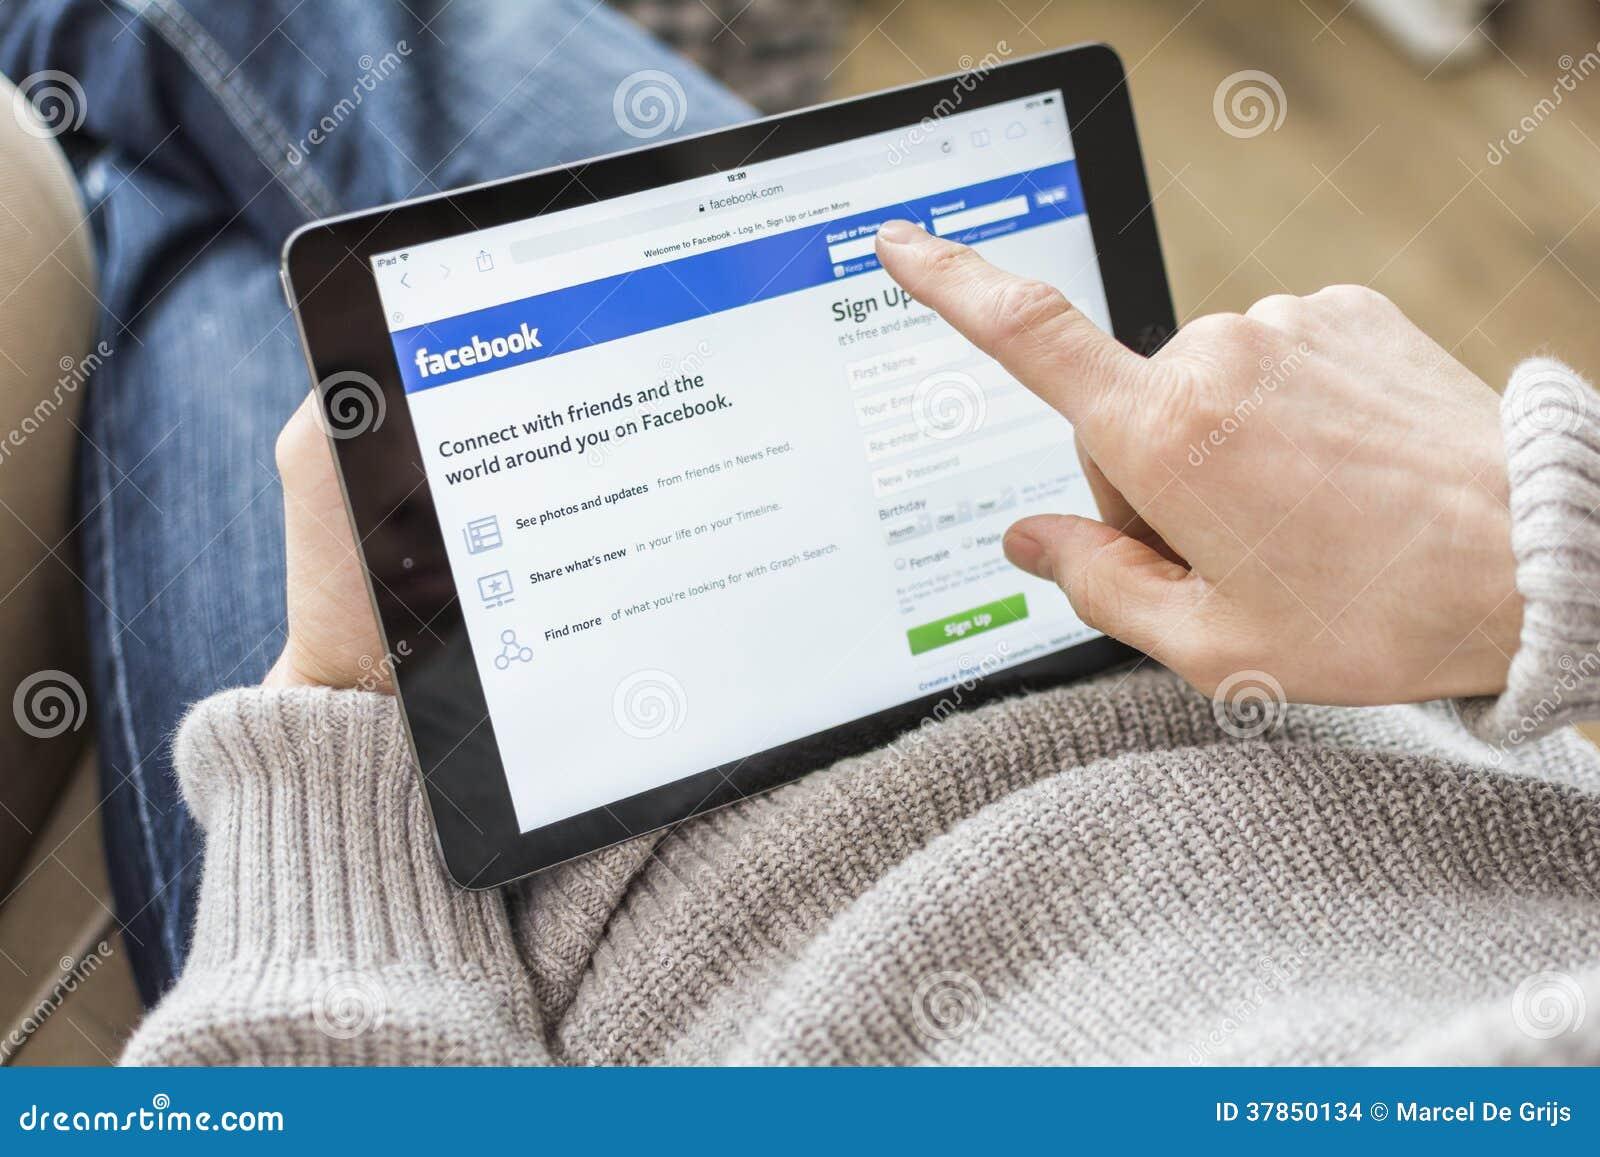 Room facebook login